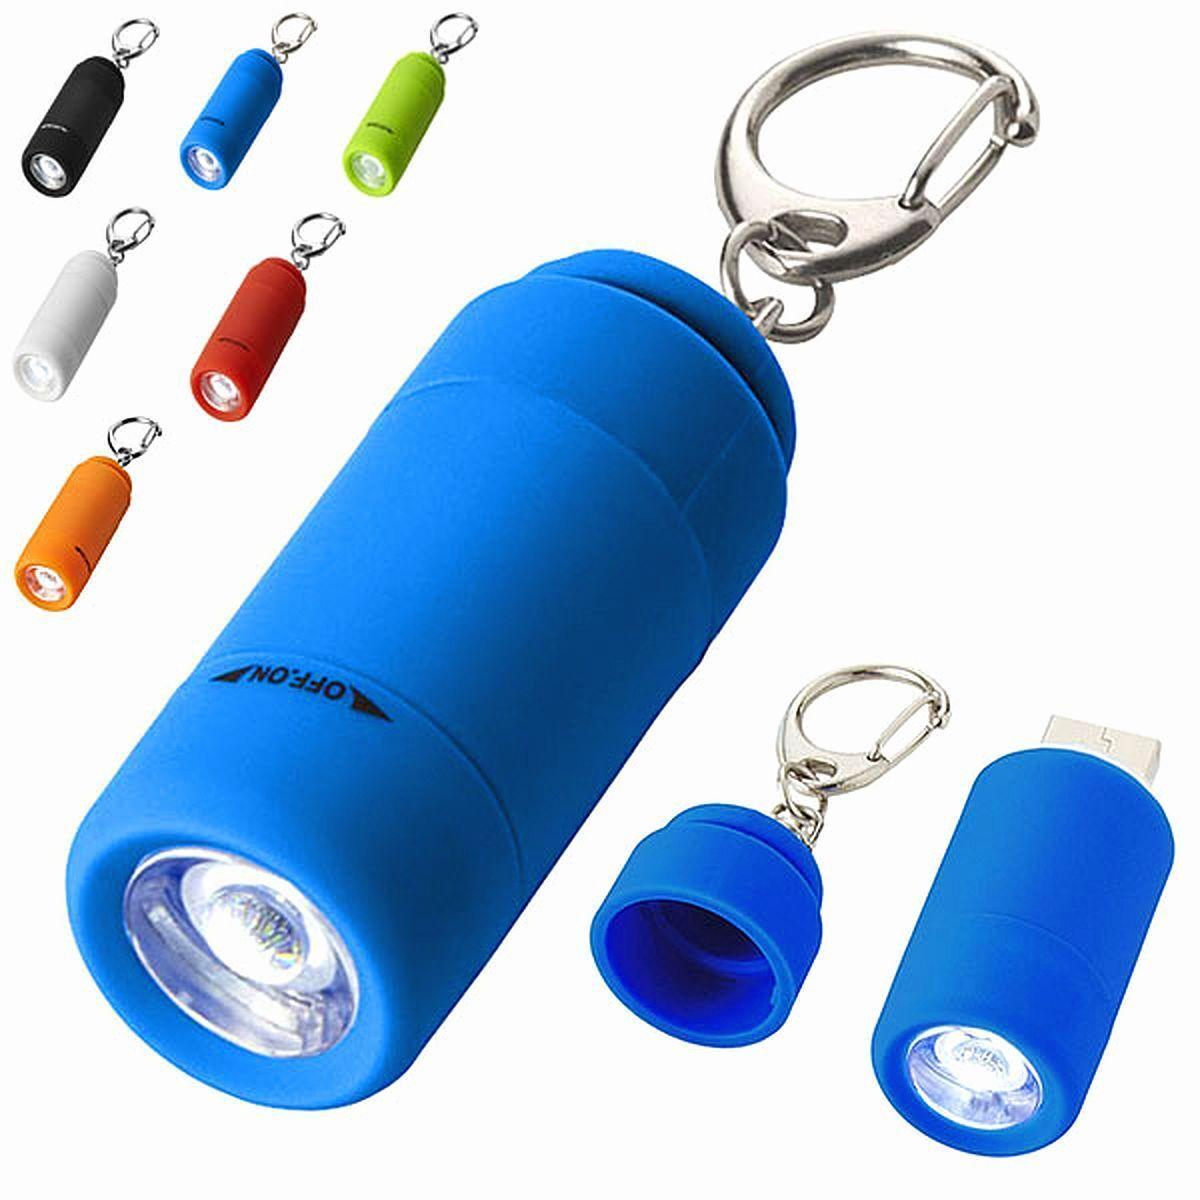 Portachiavi con Luce LED Ricaricabile Tramite USB Avior Torcia Elettrica Gadget